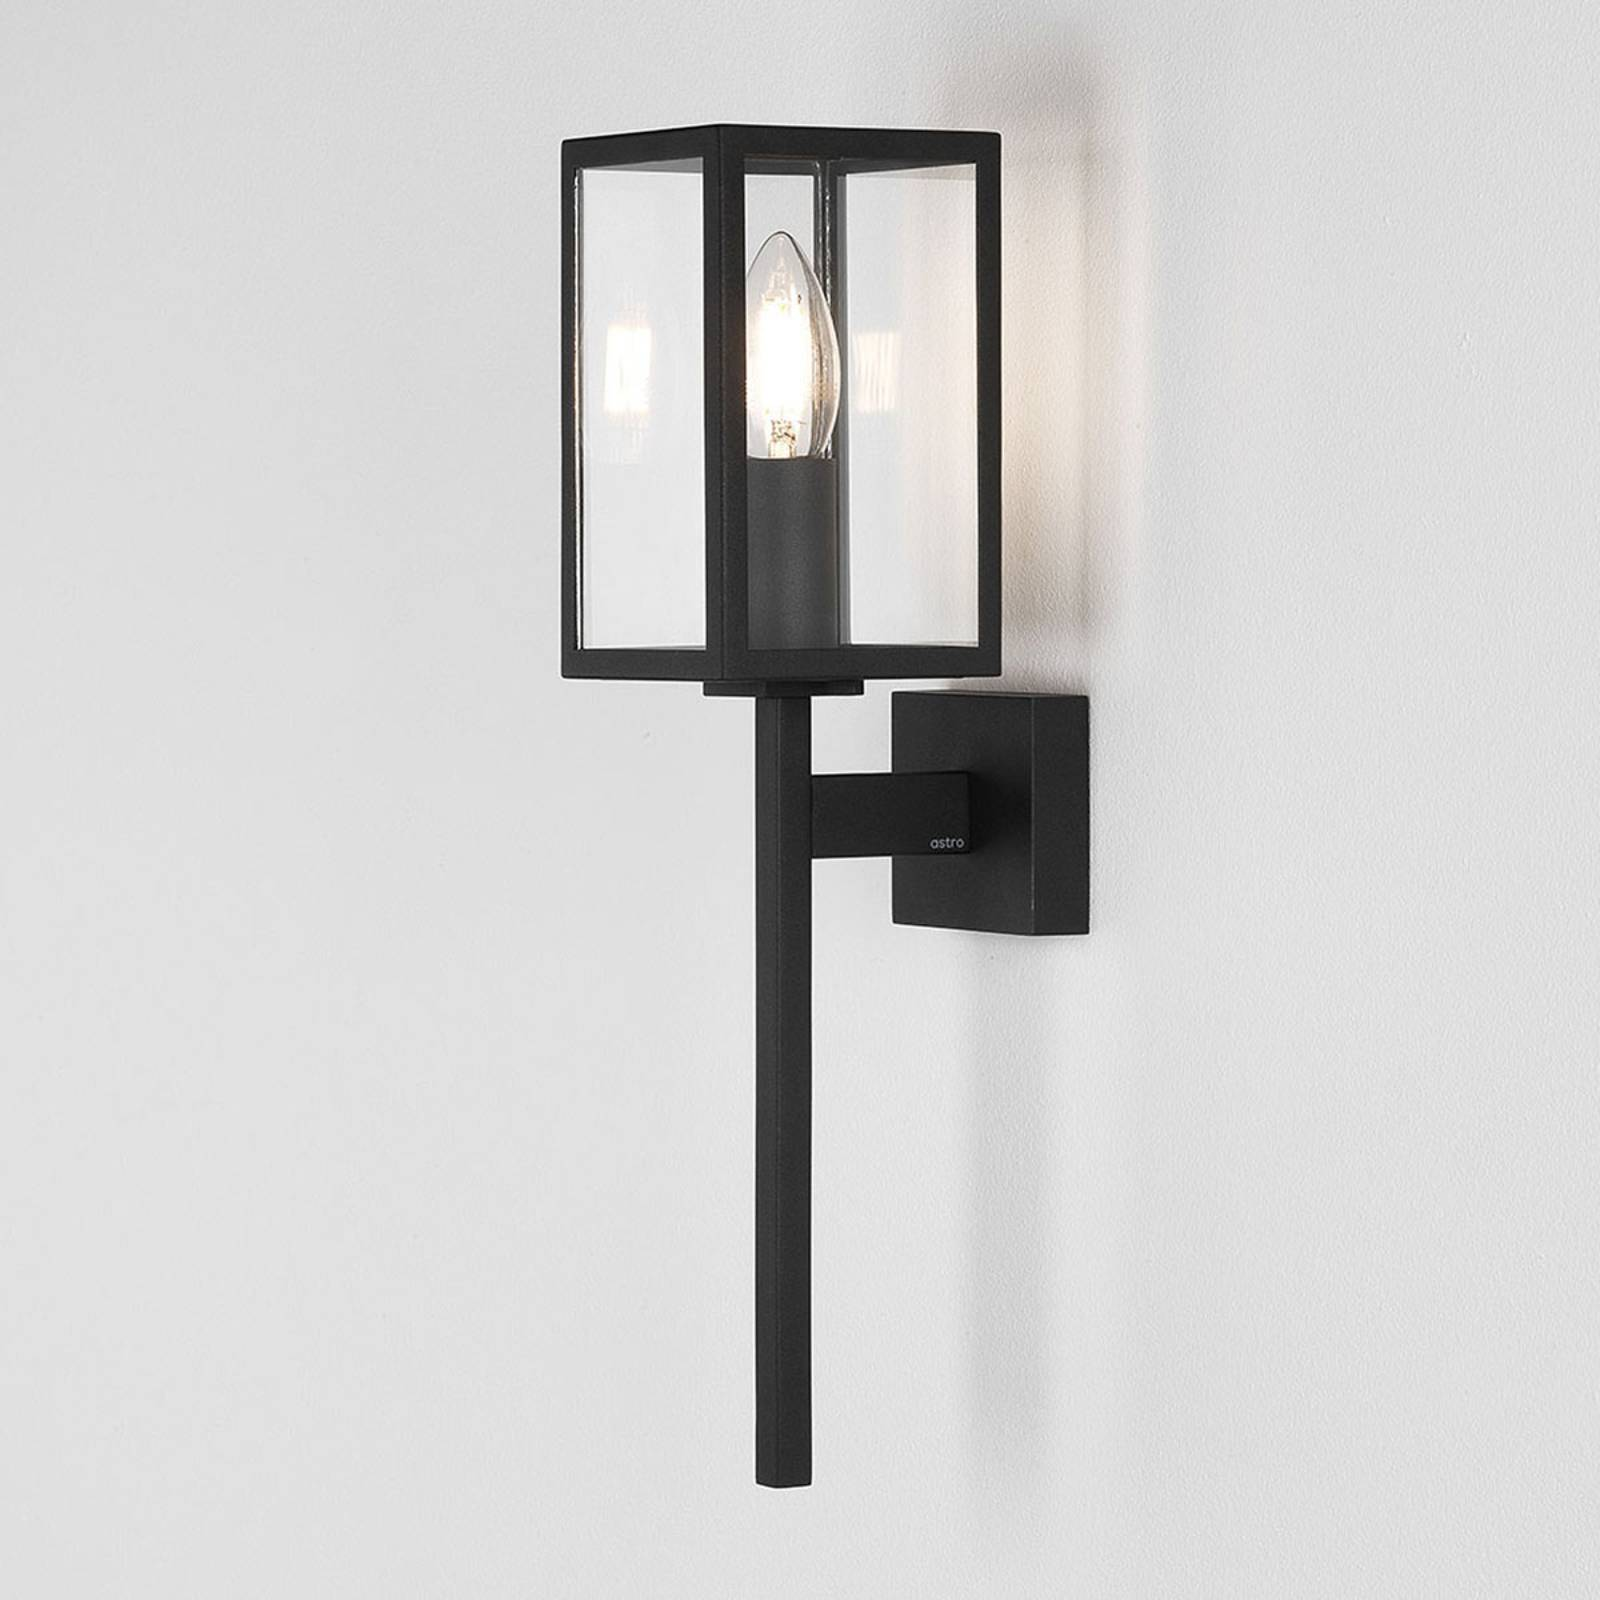 Astro Coach 100 - buitenwandlamp in zwart